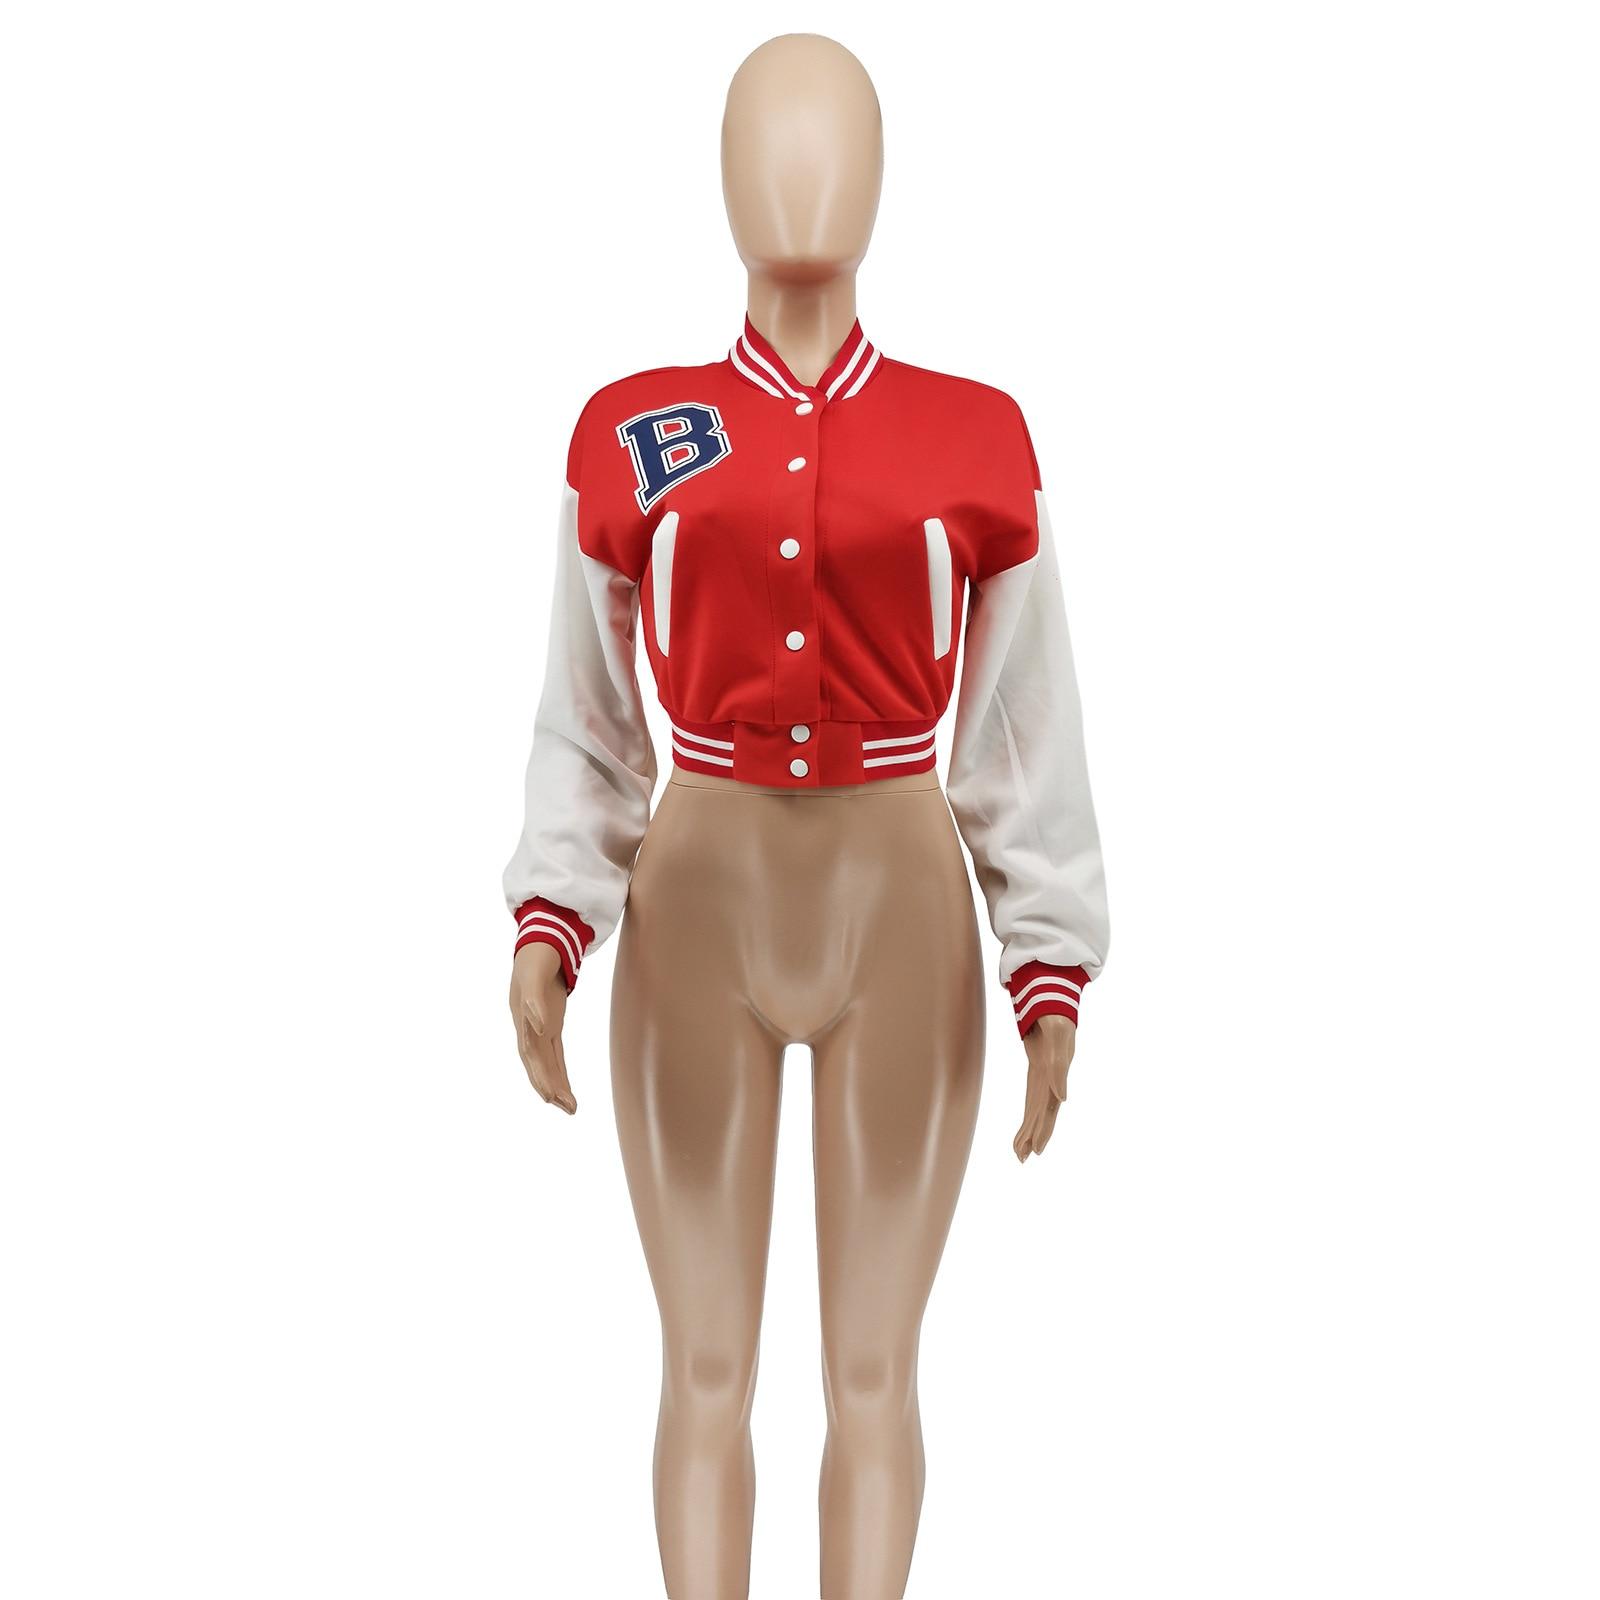 H460b4d142af0422ca8a97d597157b5646 Baseball Jackets for Women 2021 Autumn Letter Print Color Patchwork Cropped Long Sleeve Loose Short Bomber Jacket